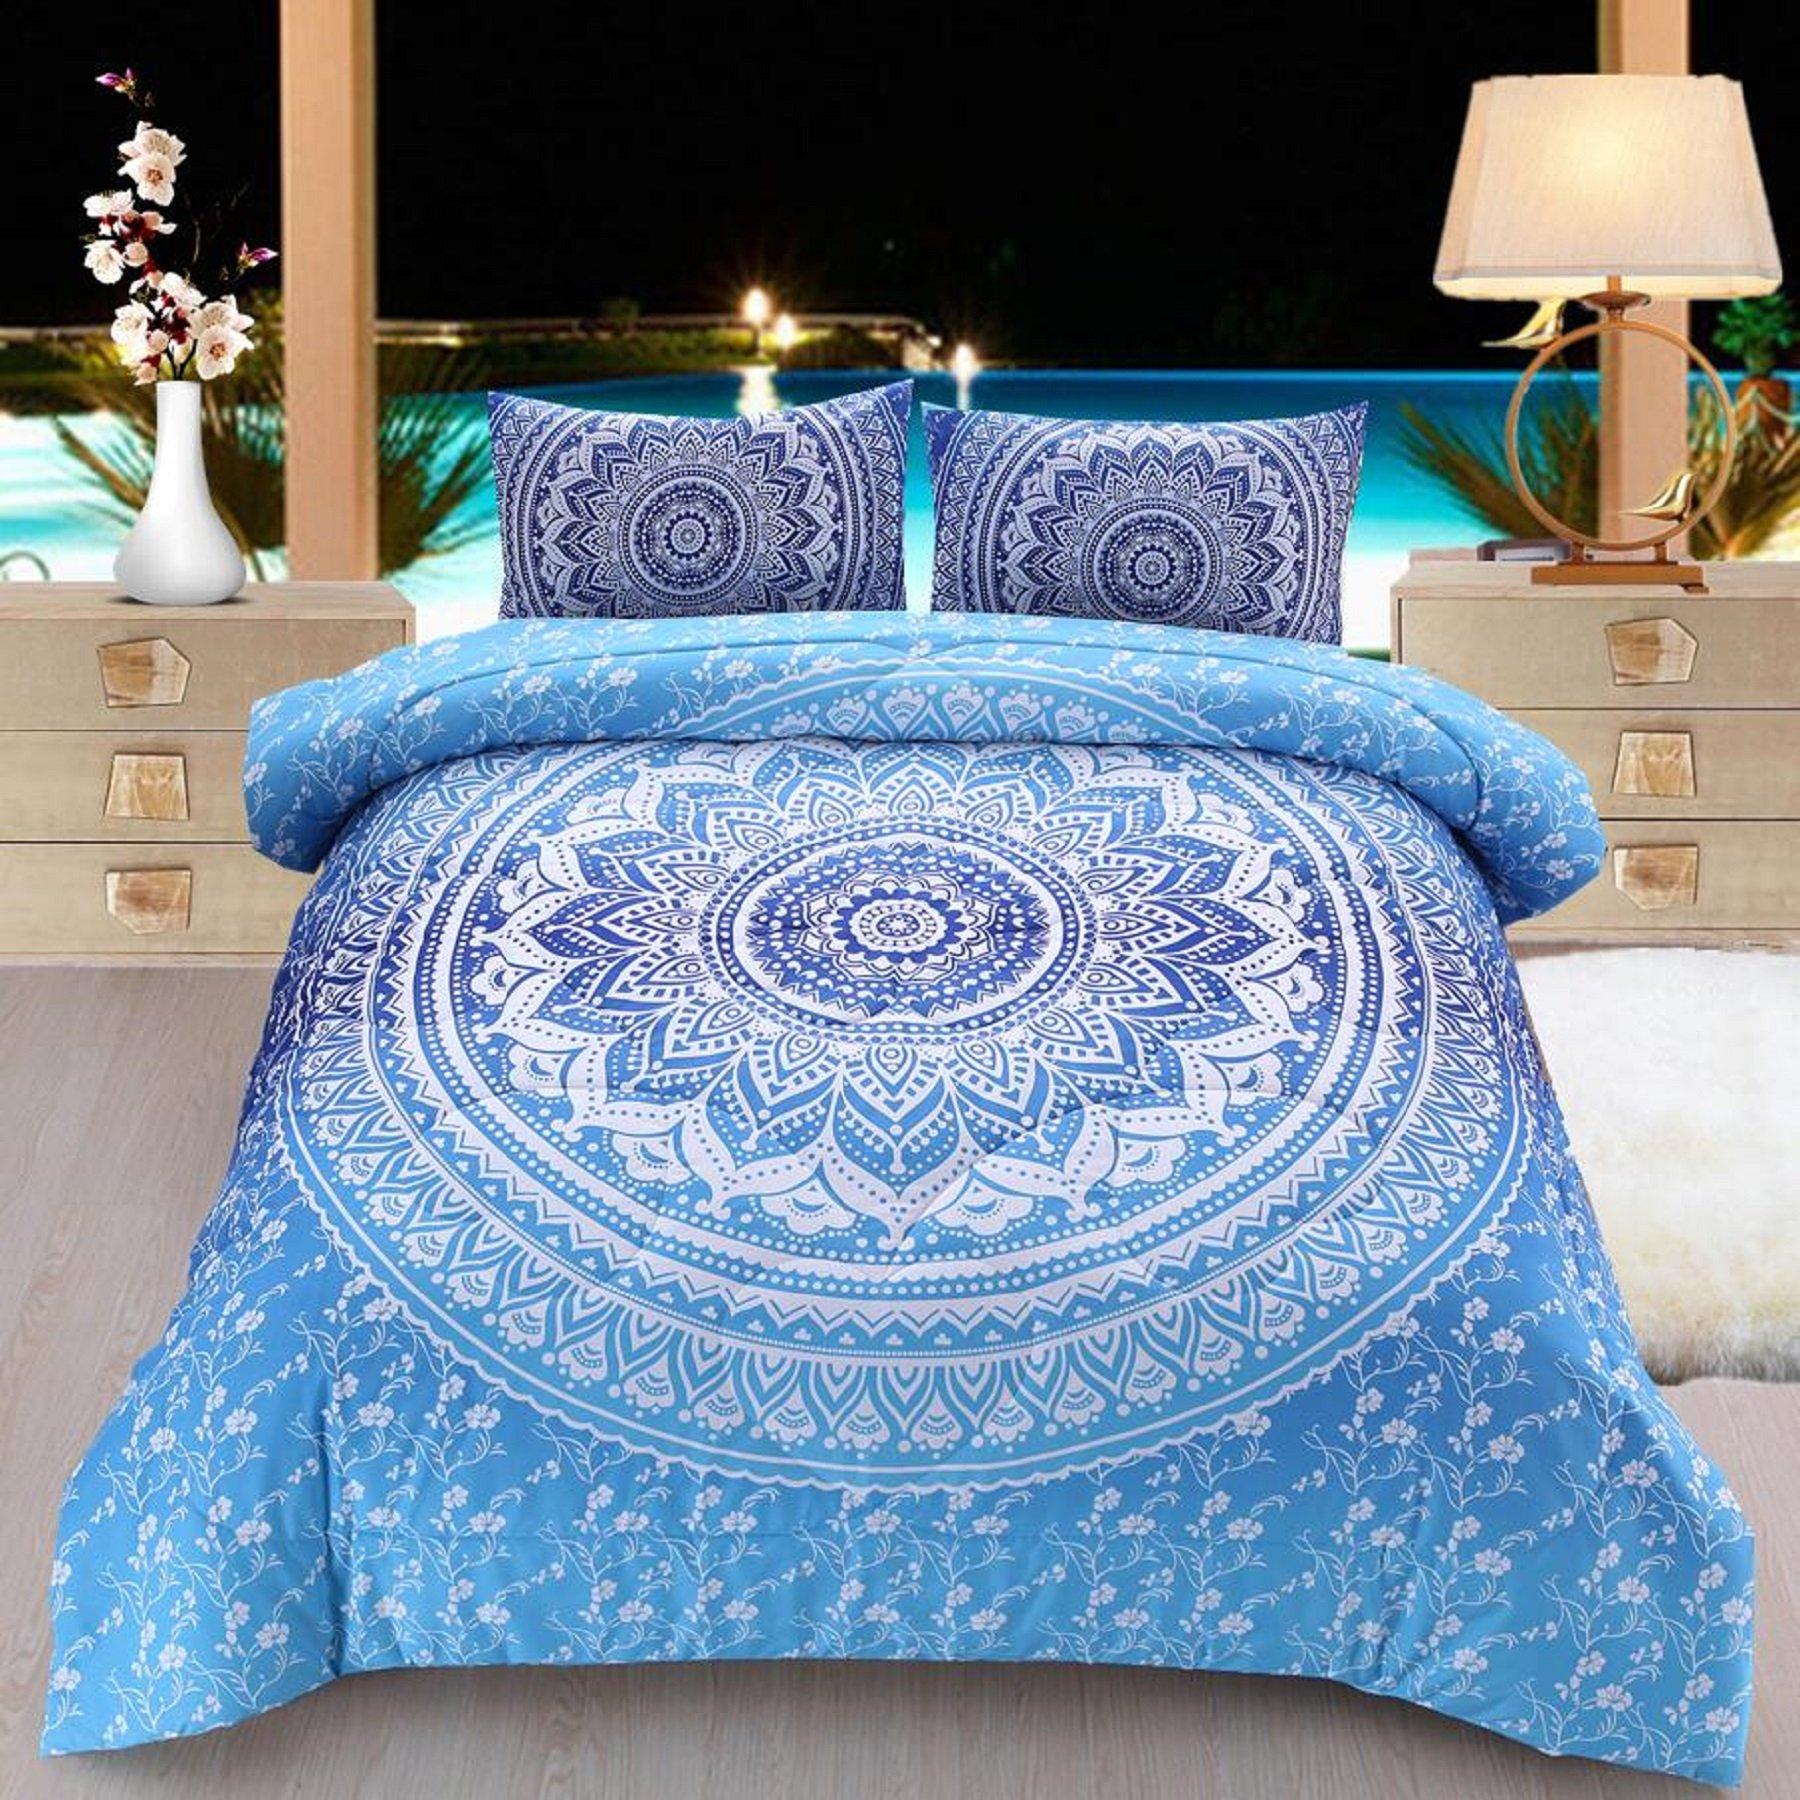 Meeting Story 3Pcs Mandala Bohemian Moonlight Bedding Bedspread Comforter Set (Blue, Queen)